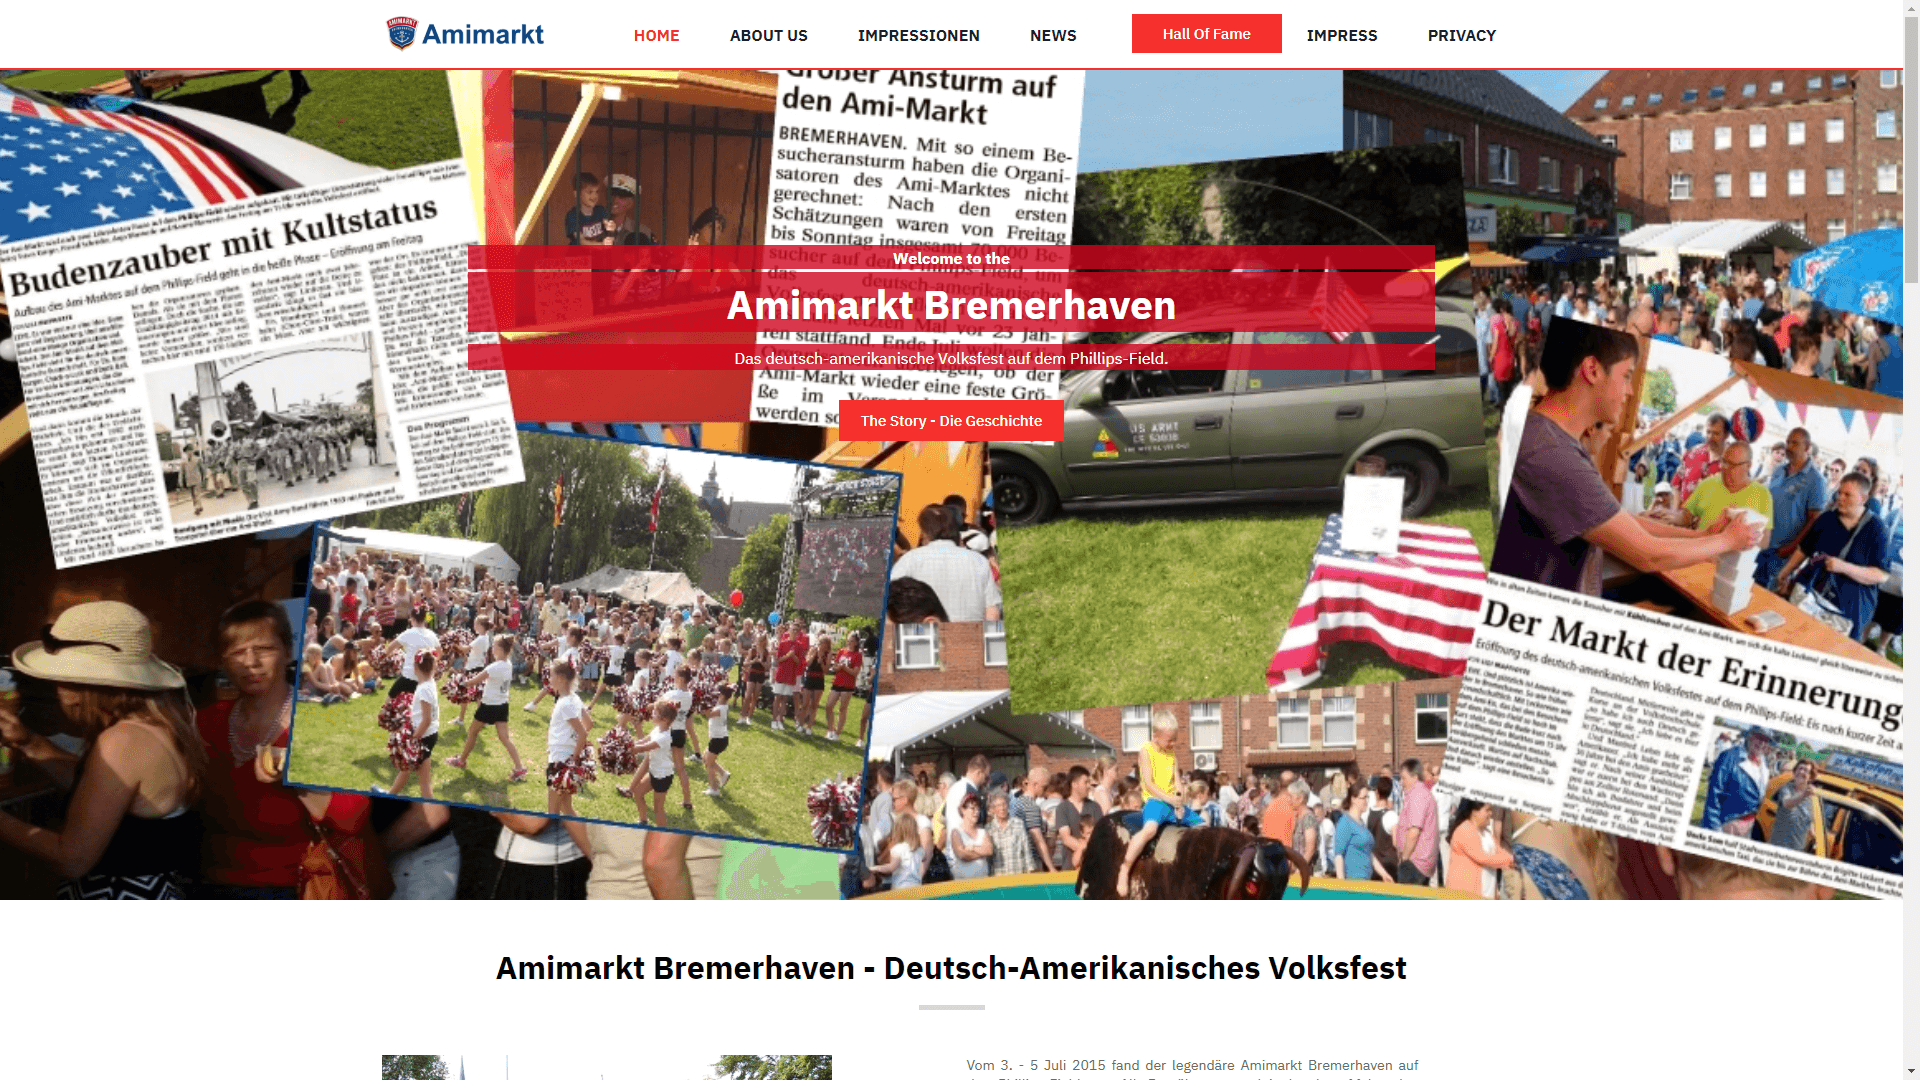 Event - Amimarkt Bremerhaven